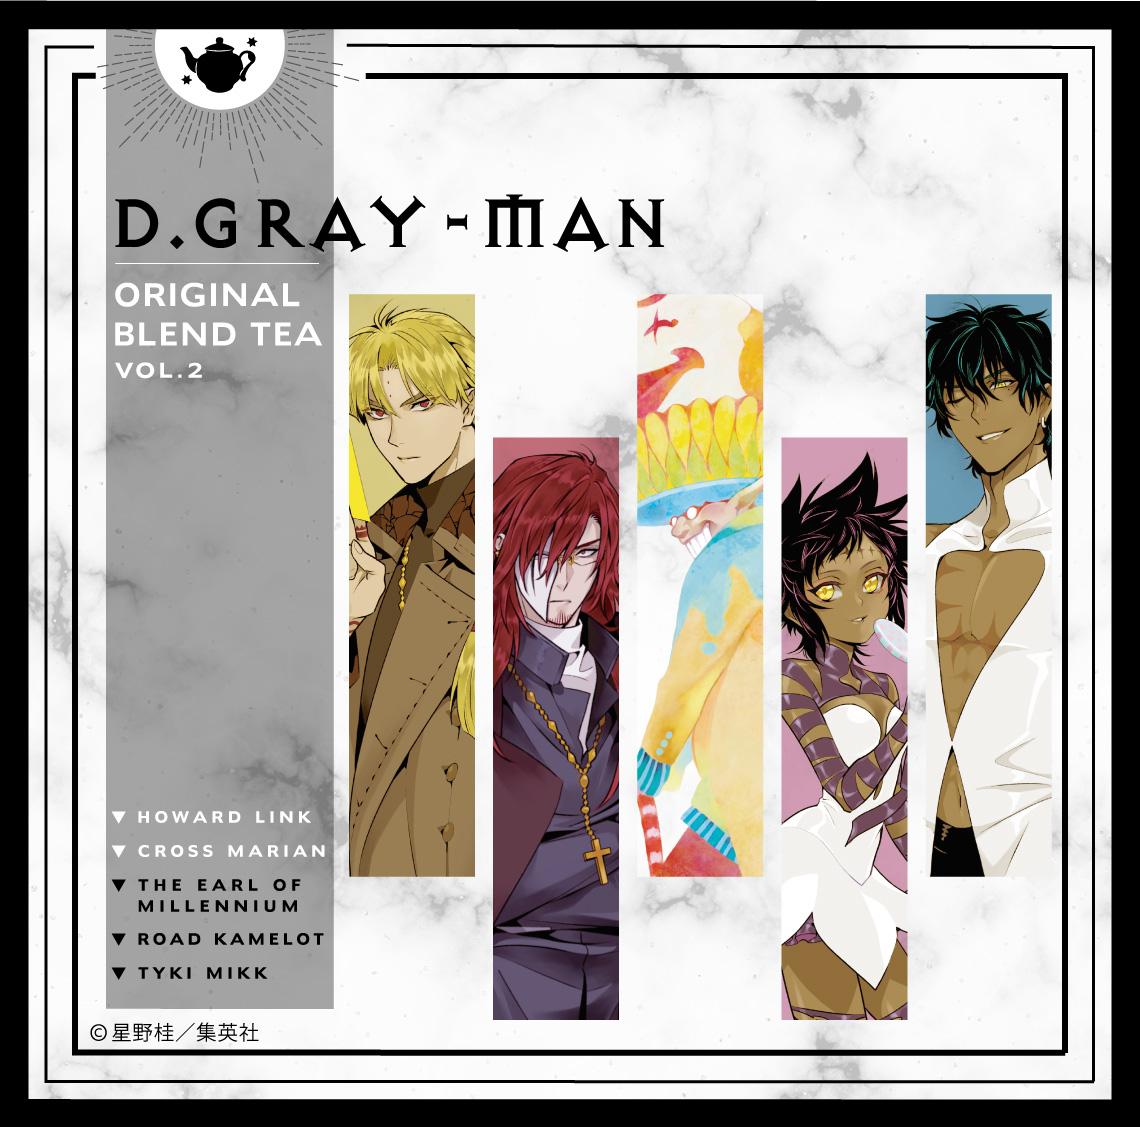 「D.Gray-man×銀色猫喫茶室」ブレンドティー第2弾はノアやクロス元帥!店舗での提供も